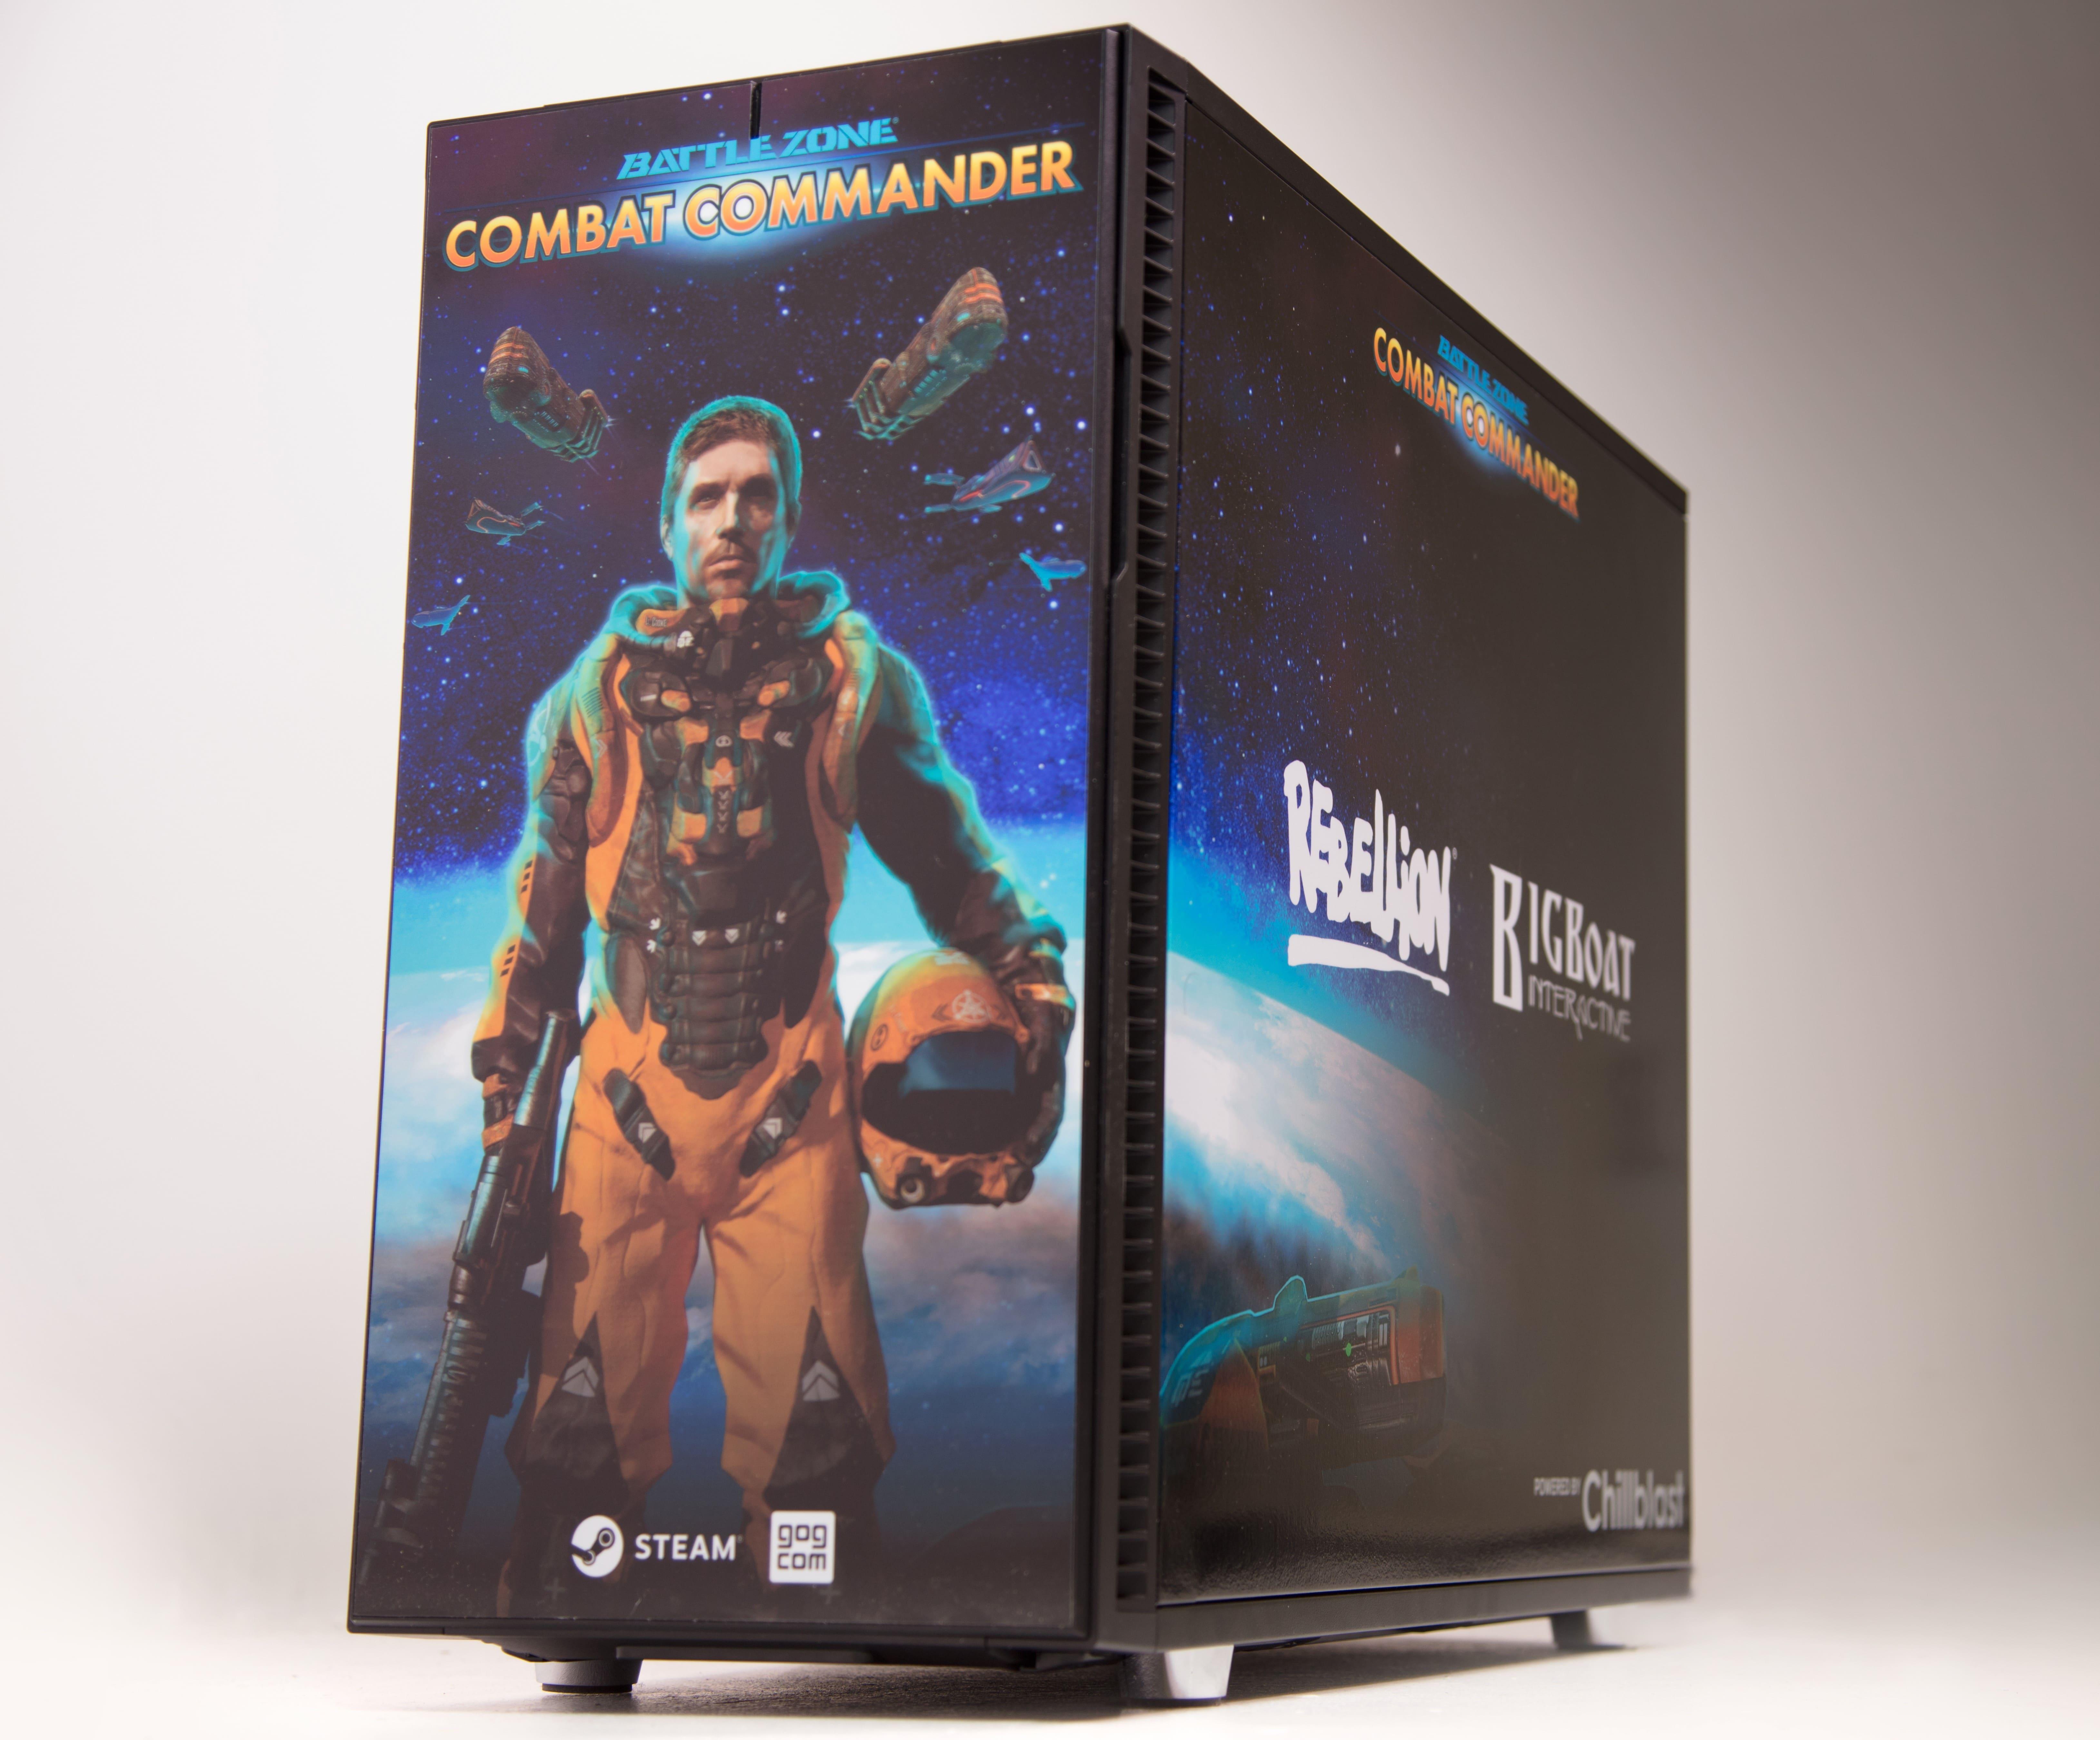 Battlezone Combat Commander | Out now on PC!